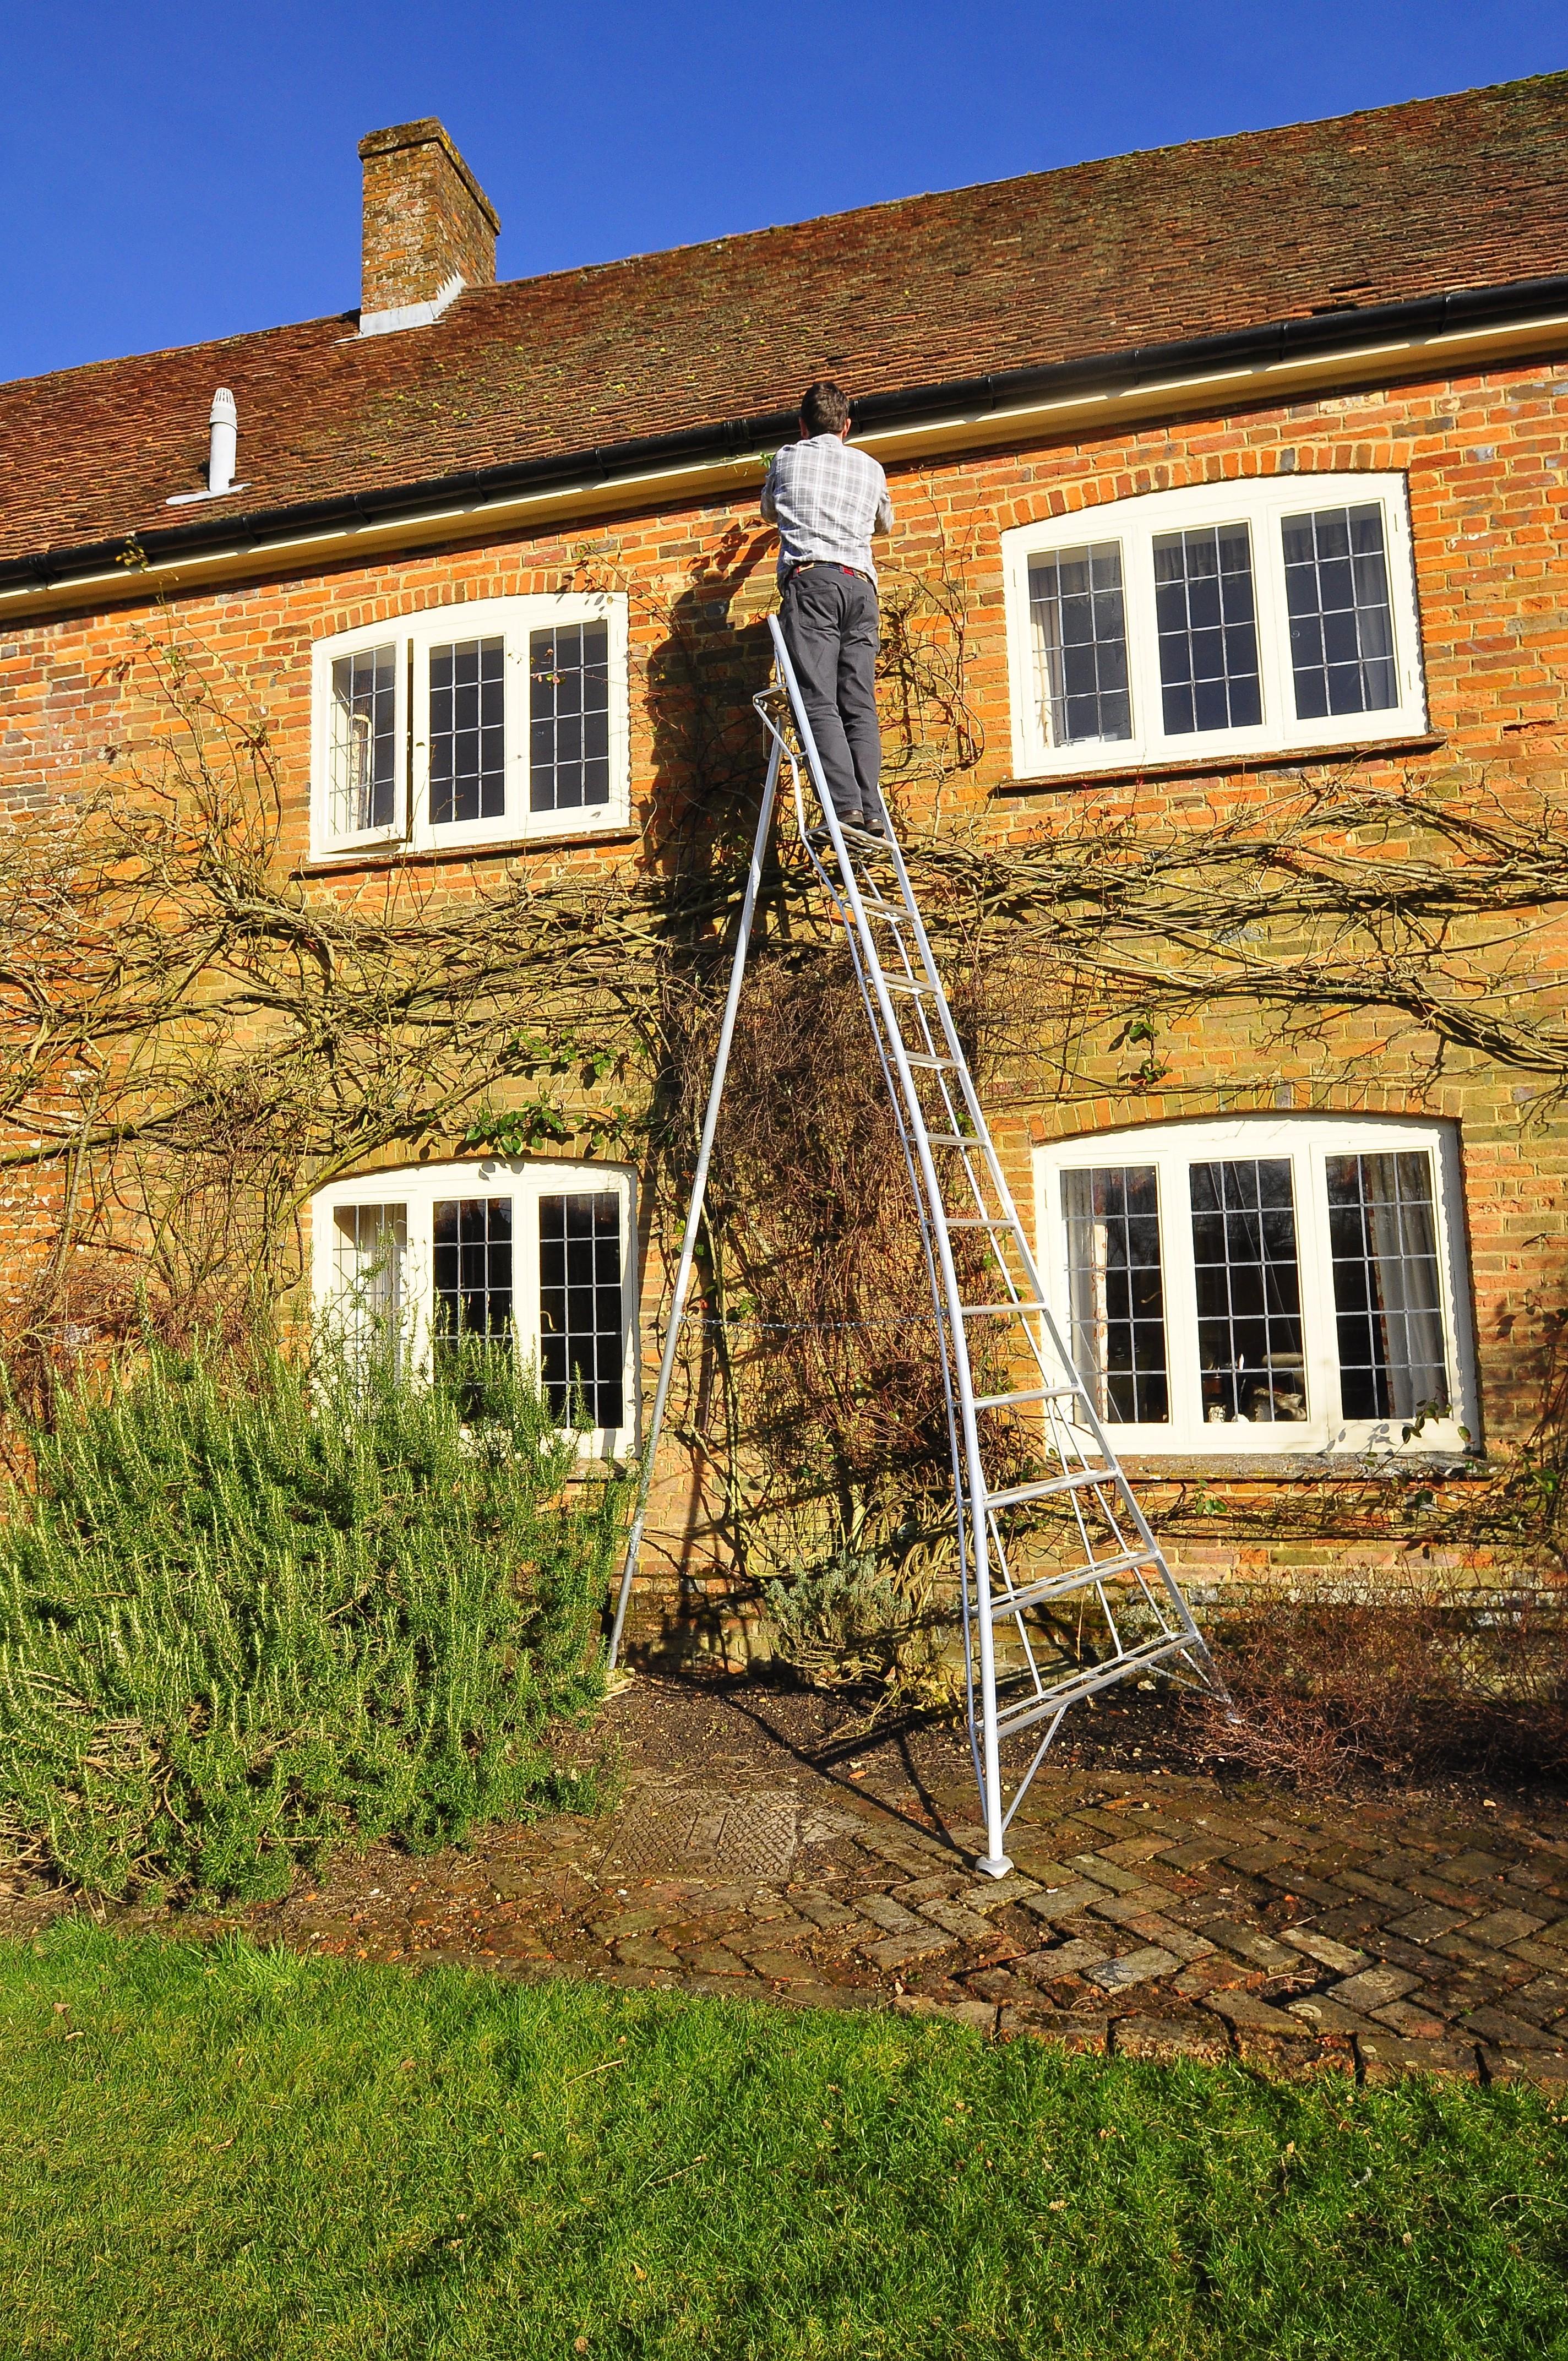 Henchman Platform Tripod Ladder - 1 Adjustable leg 12ft